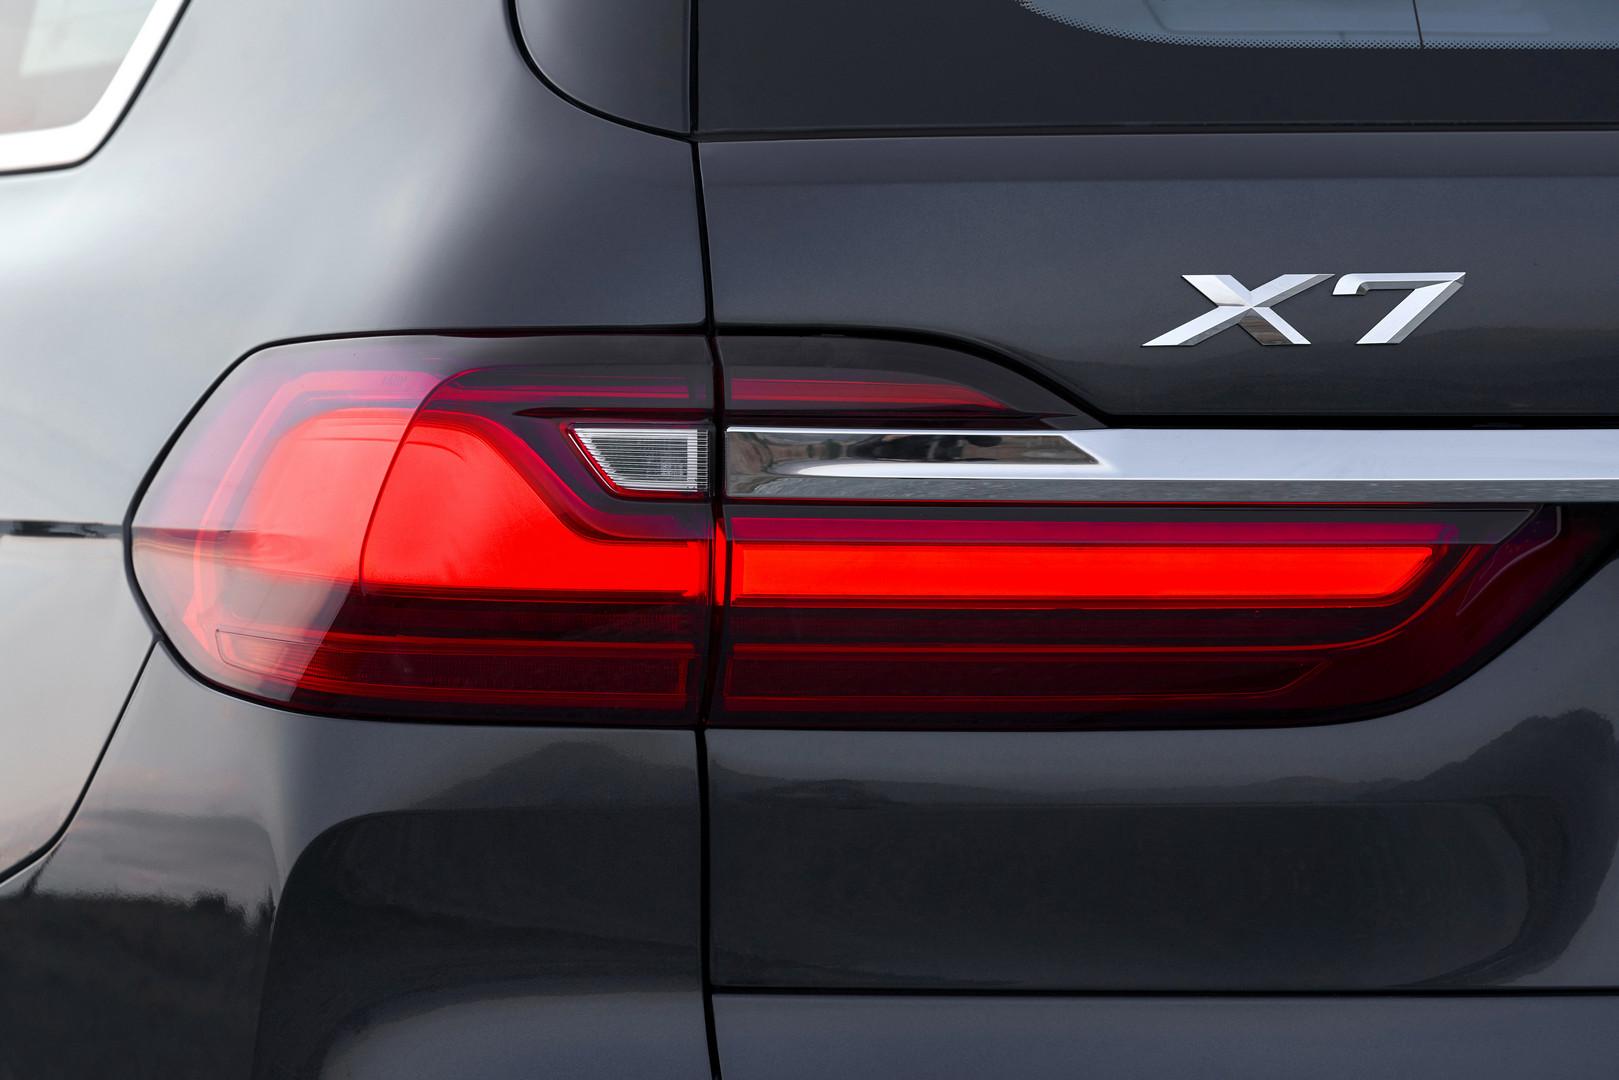 2019 BMW X7 Badge